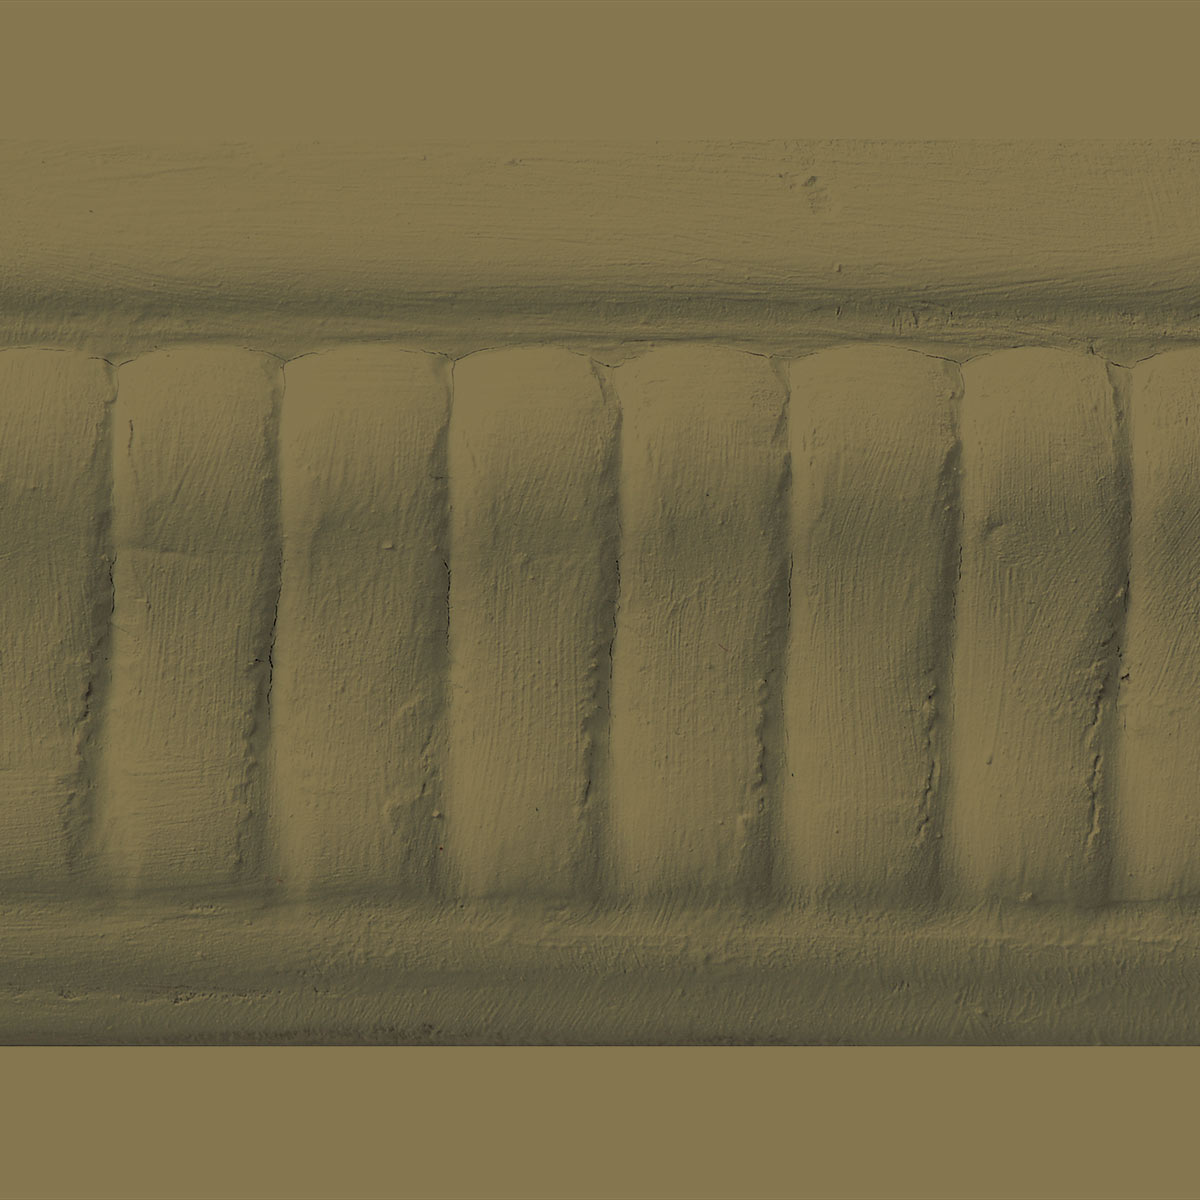 Waverly ® Inspirations Chalk Finish Acrylic Paint - Fawn, 8 oz.